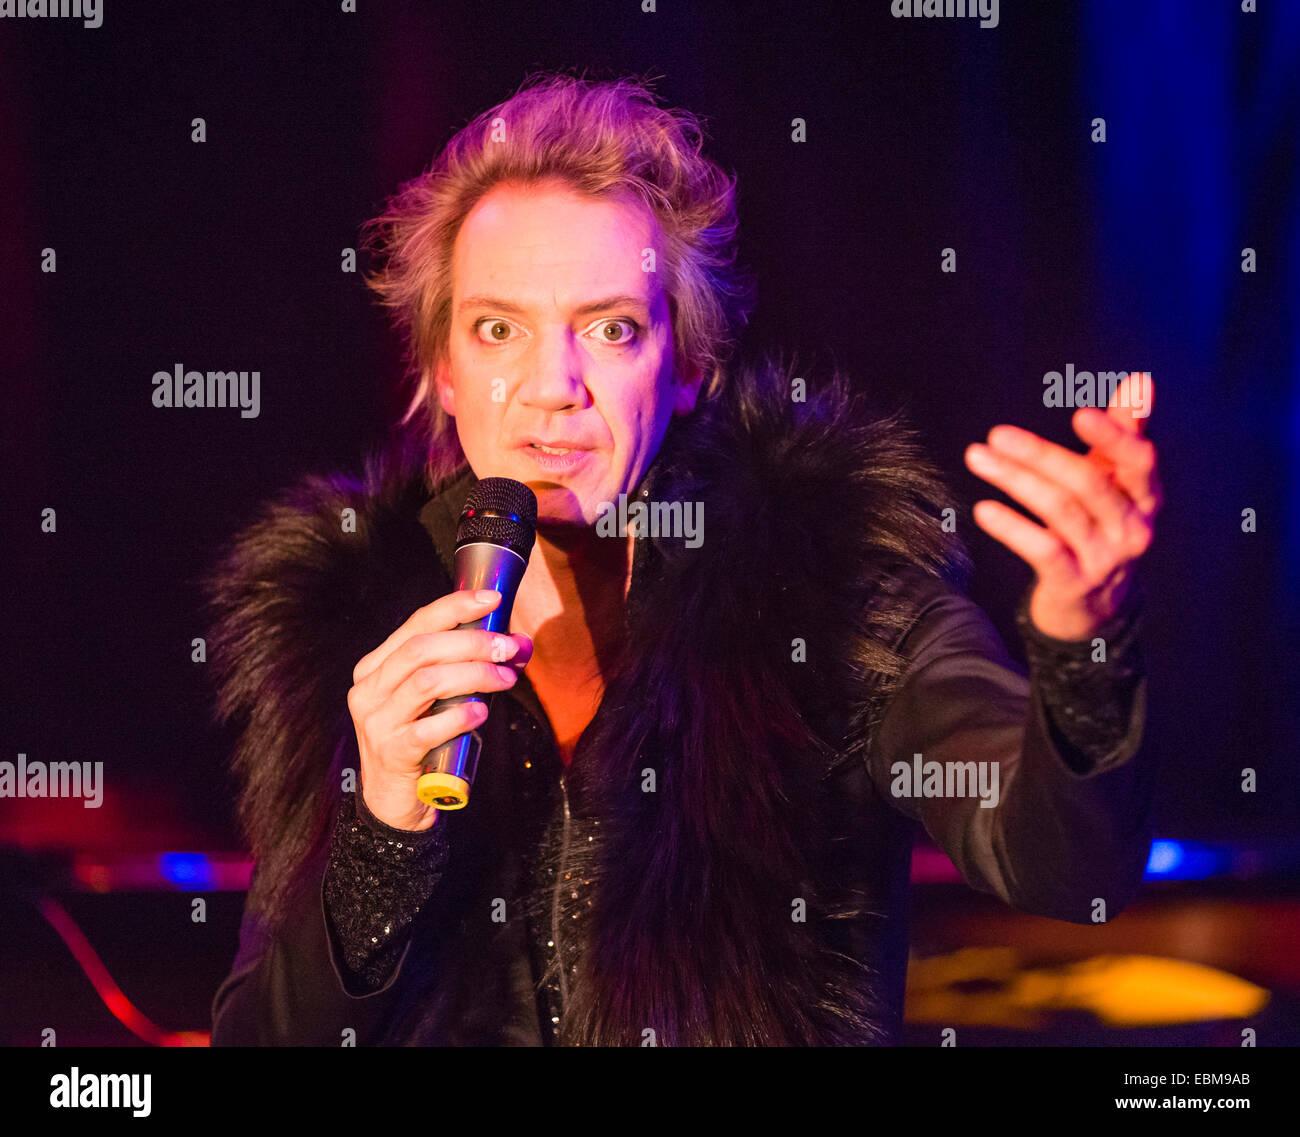 Entertainer Sven Ratzke shows his performance  'Diva Diva's'. - Stock Image